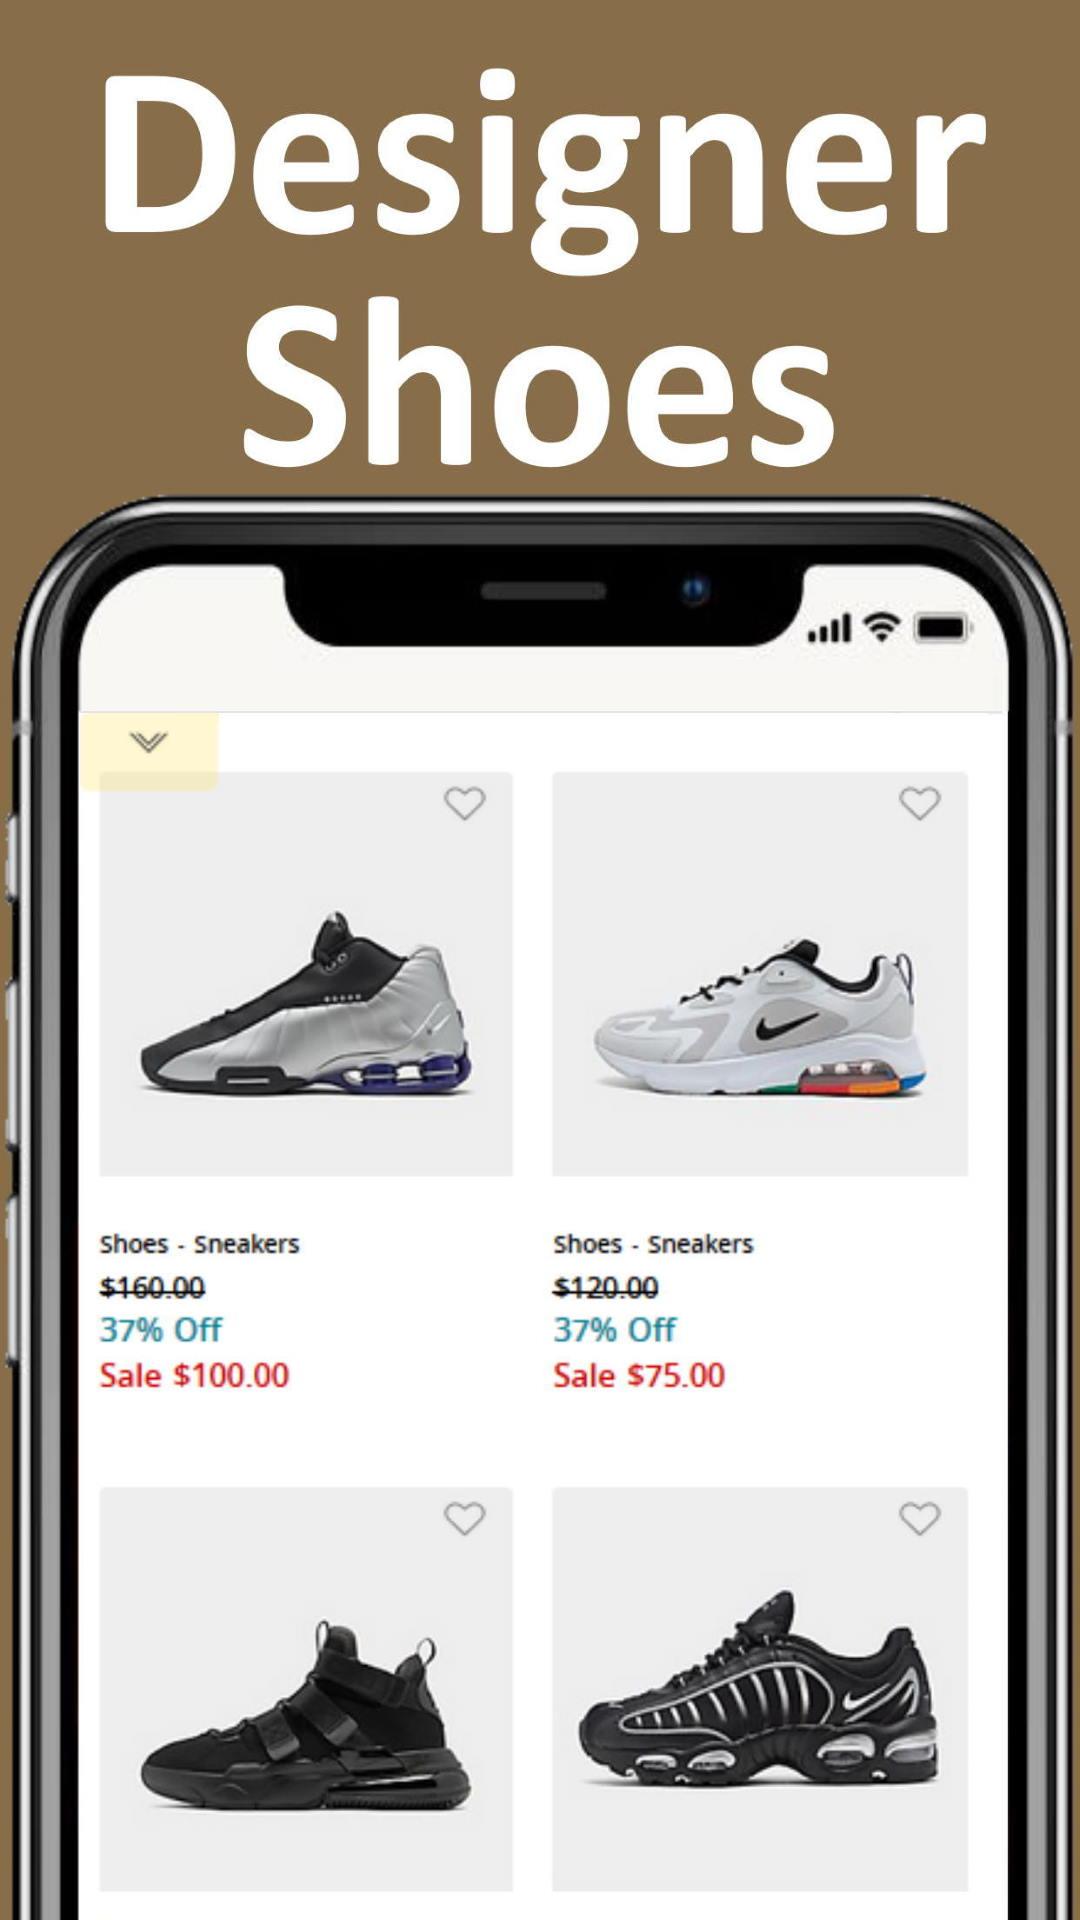 Designer Apparel Sales